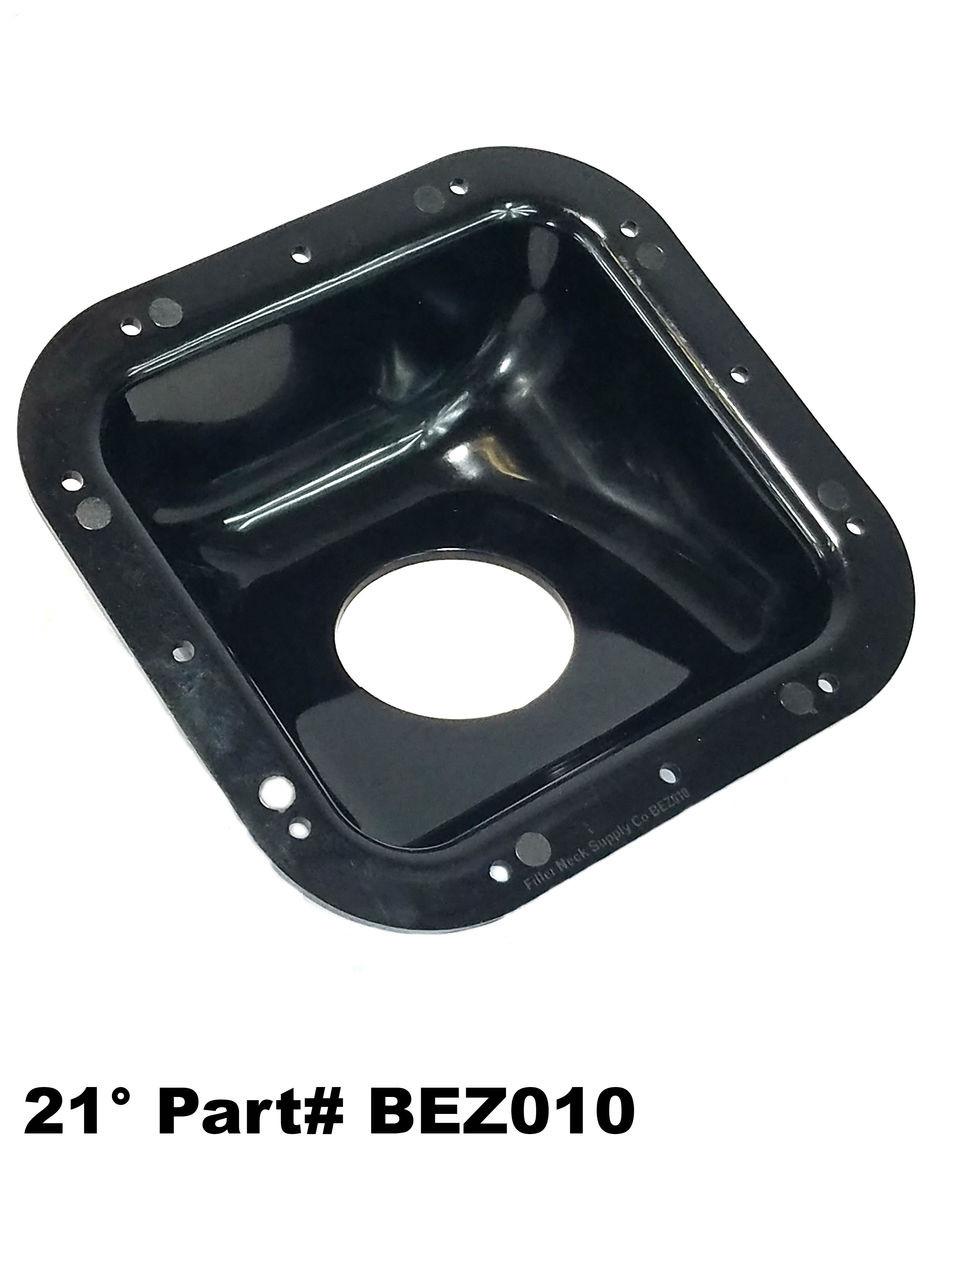 Diesel Gas Fuel Filler Neck Housing Protector Bezel Service Body Box Truck Square Plastic Degree on Dodge Dakota Diesel